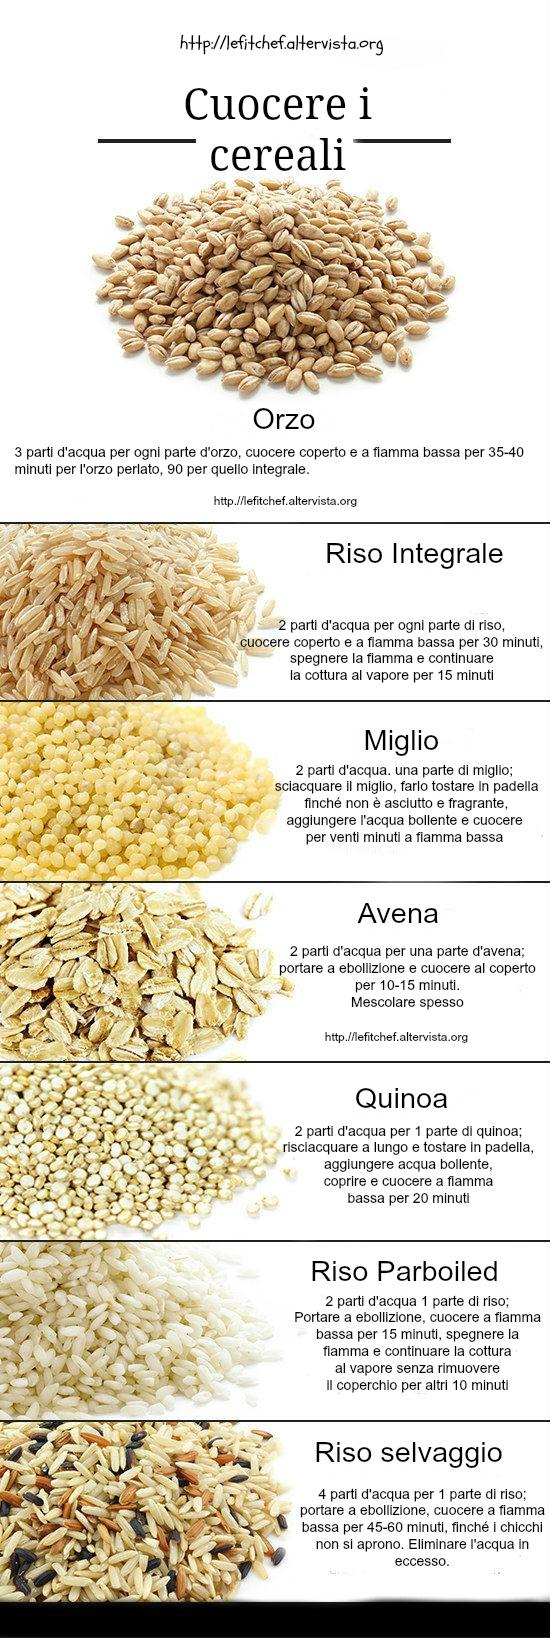 cuocere i cereali lefitchef